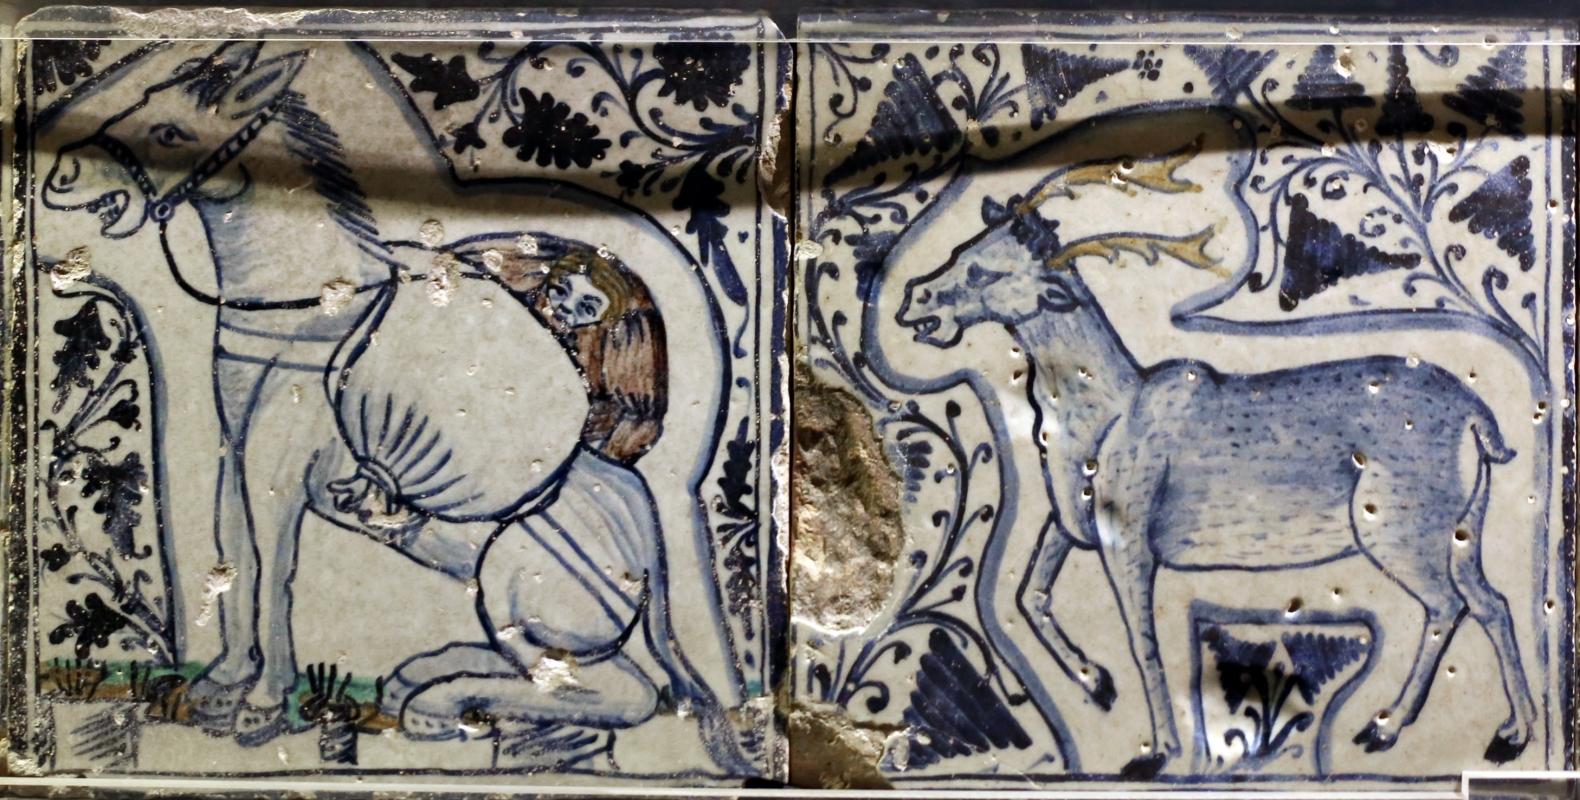 Bottega pesarese, pavimento maiolicato dal monastero di san paolo a parma, 1470-82 ca., asino e cervo - Sailko - Parma (PR)